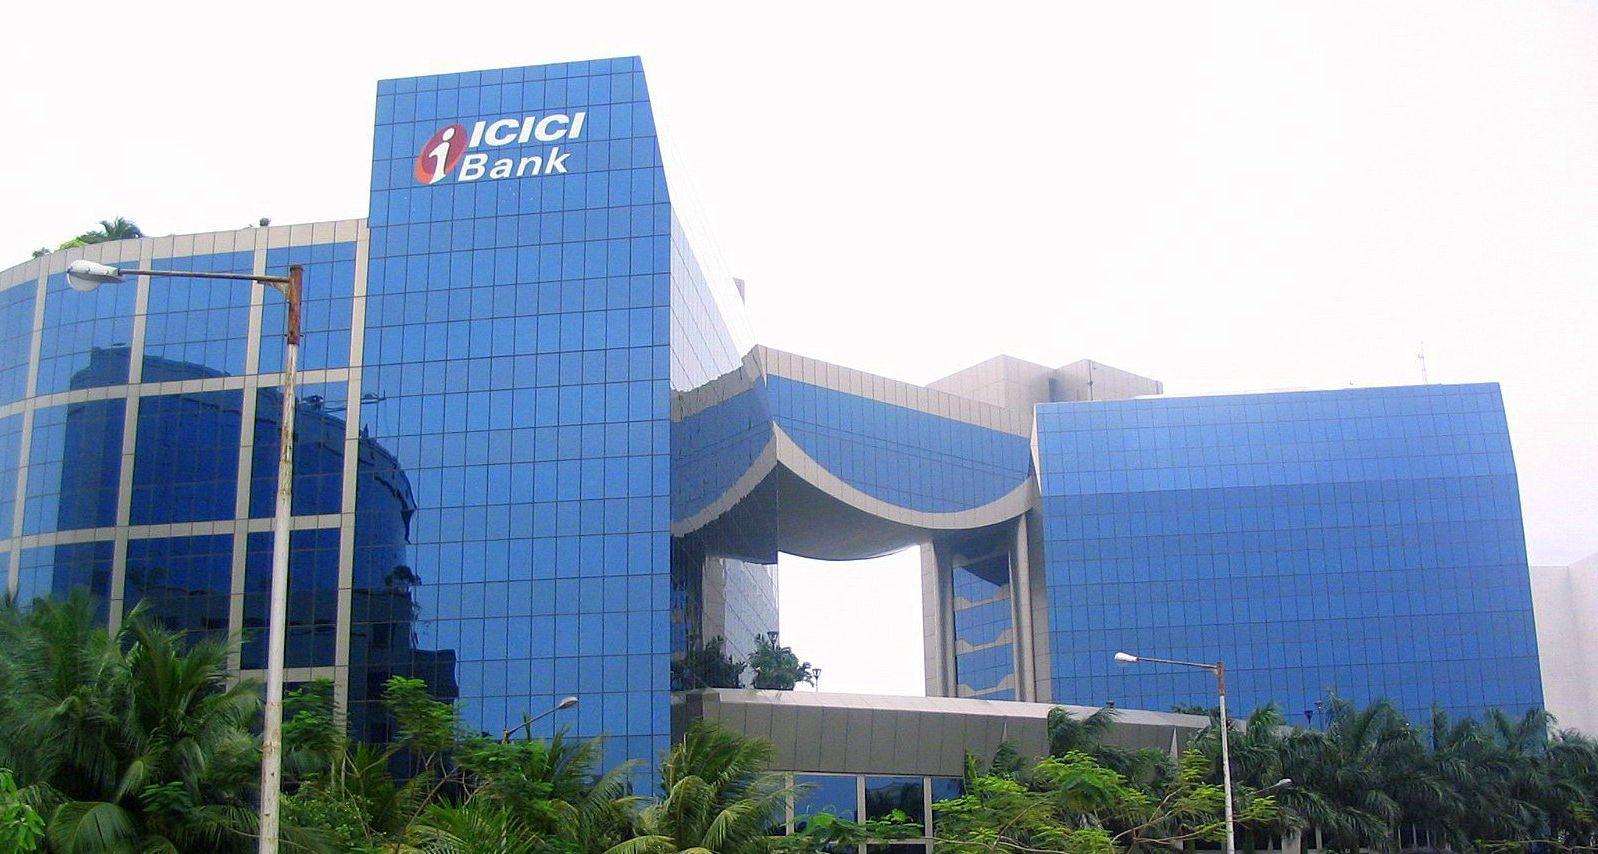 ICICI Bank - Wikipedia